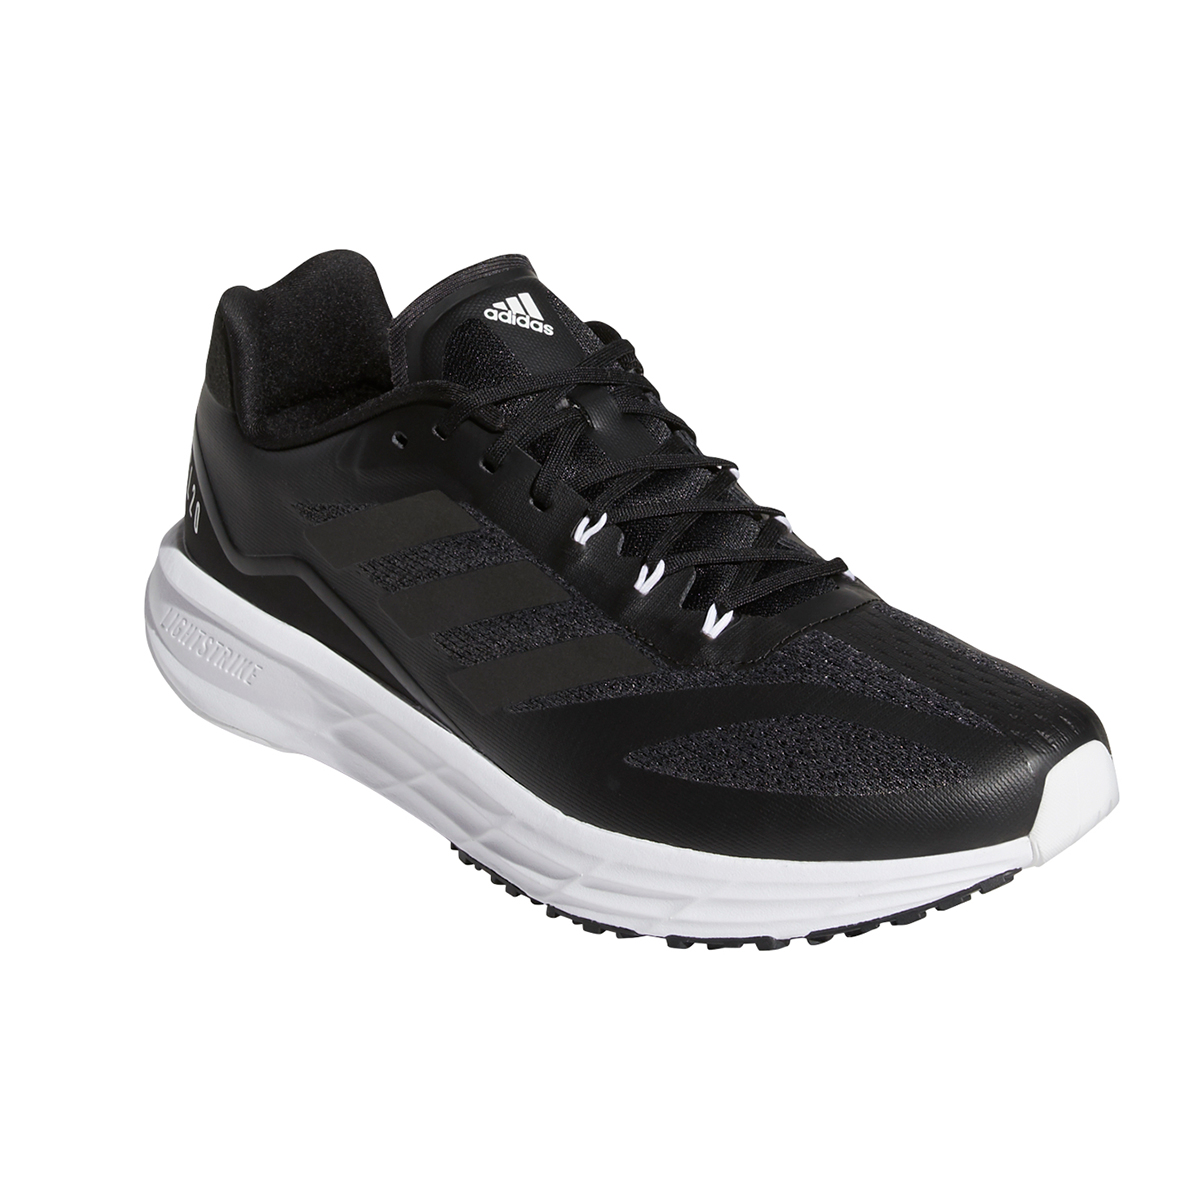 Men's Adidas SL20.2 Running Shoe - Color: Core Black/Grey - Size: 6.5 - Width: Regular, Core Black/Grey, large, image 3